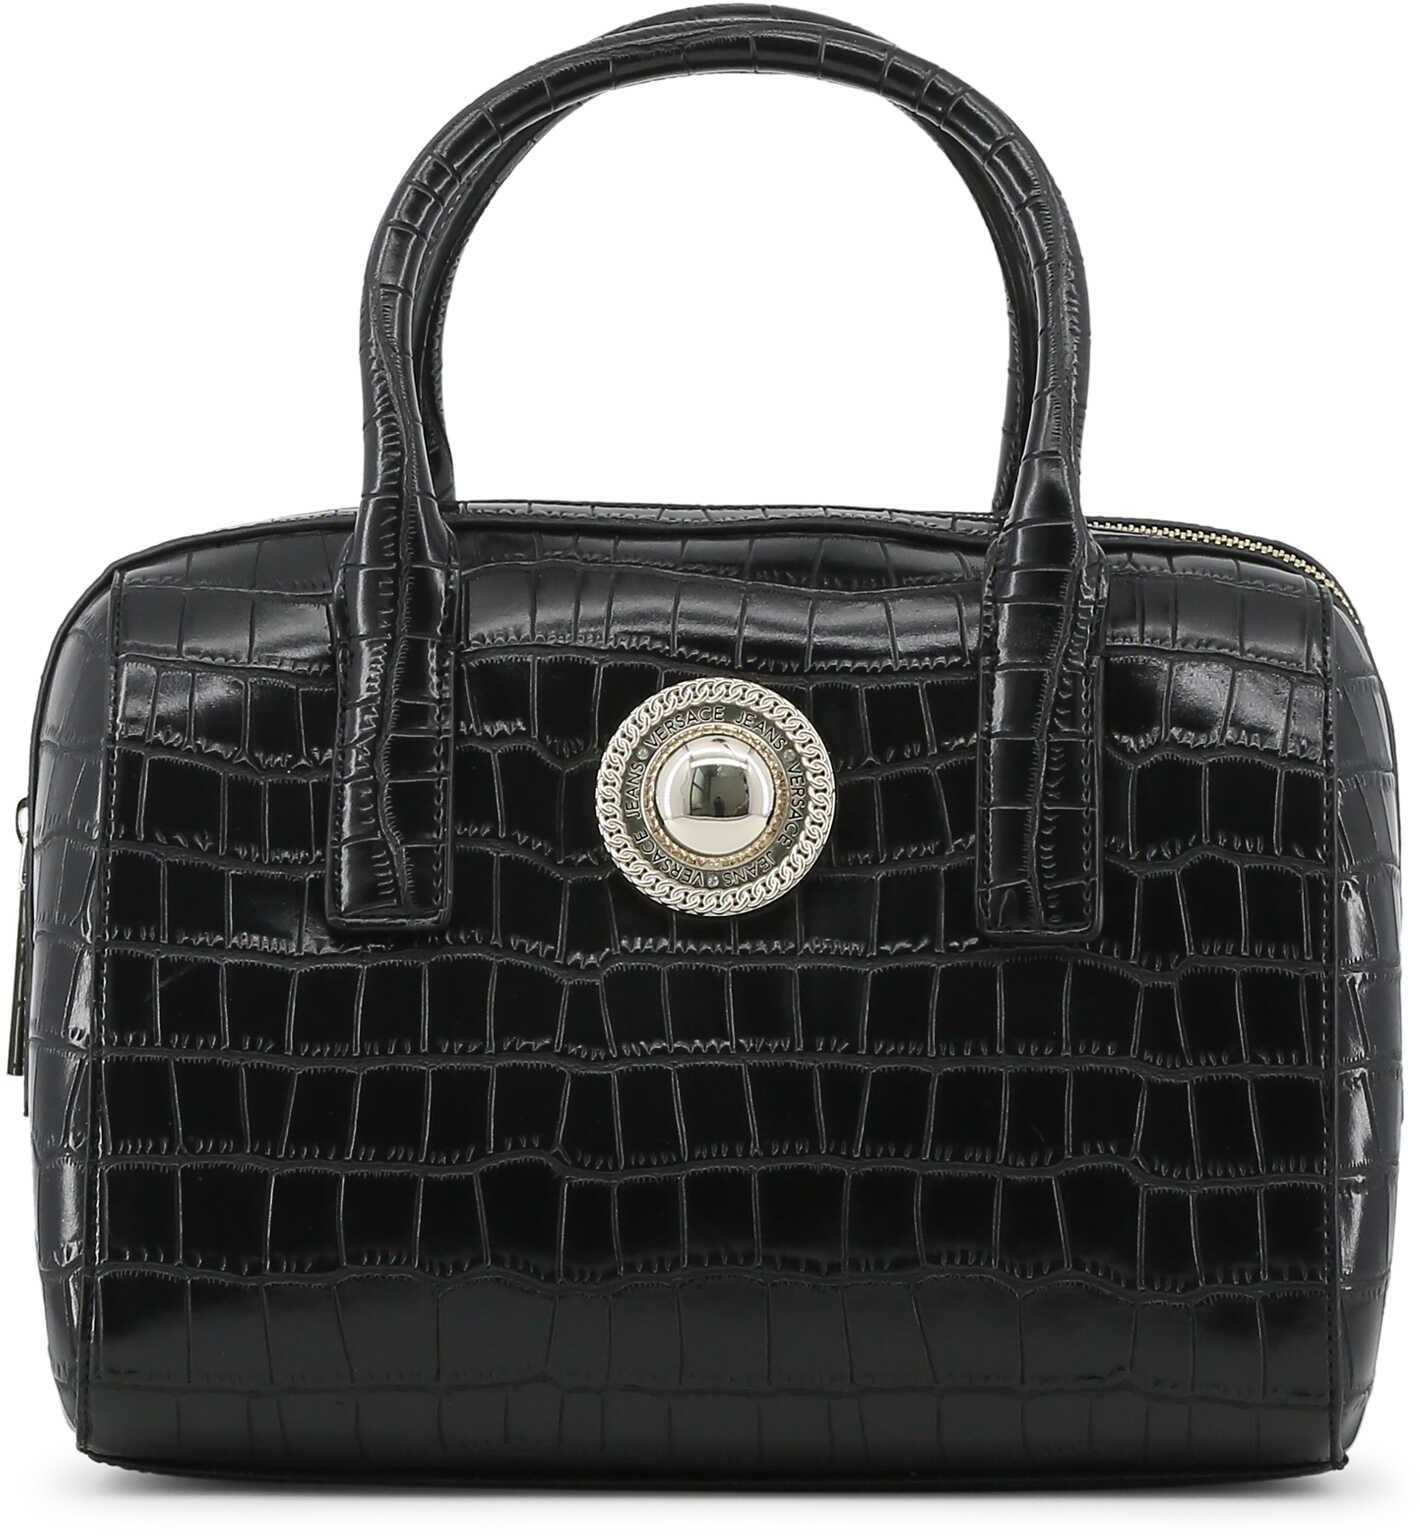 Versace Jeans E1Vqbbg7_75456 Black